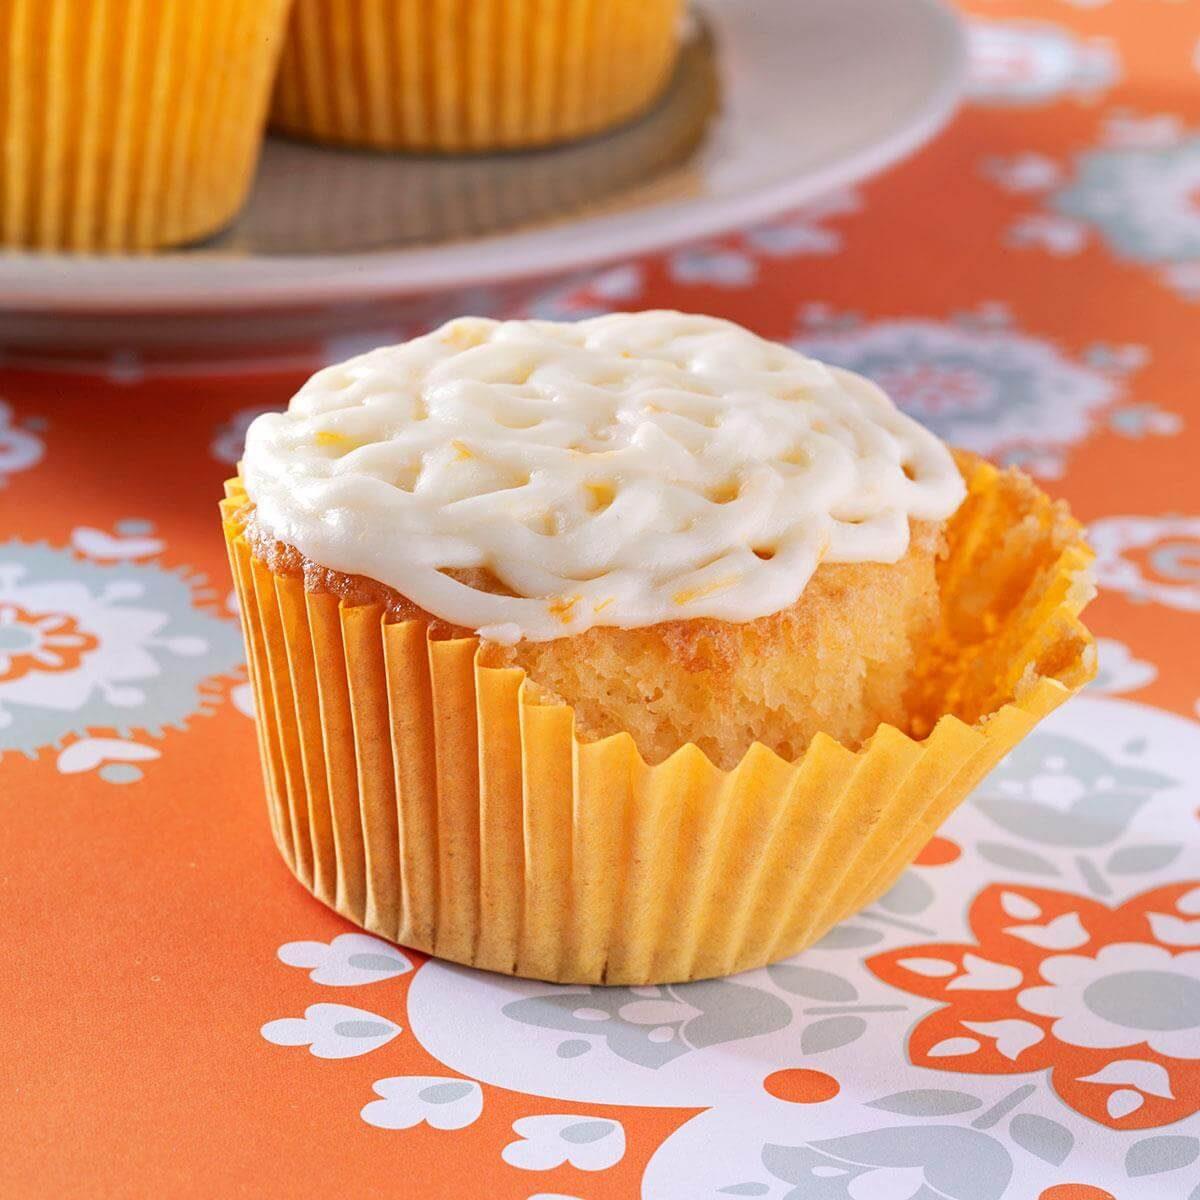 Ansprechend Halloween Cupcakes Rezepte Beste Wahl